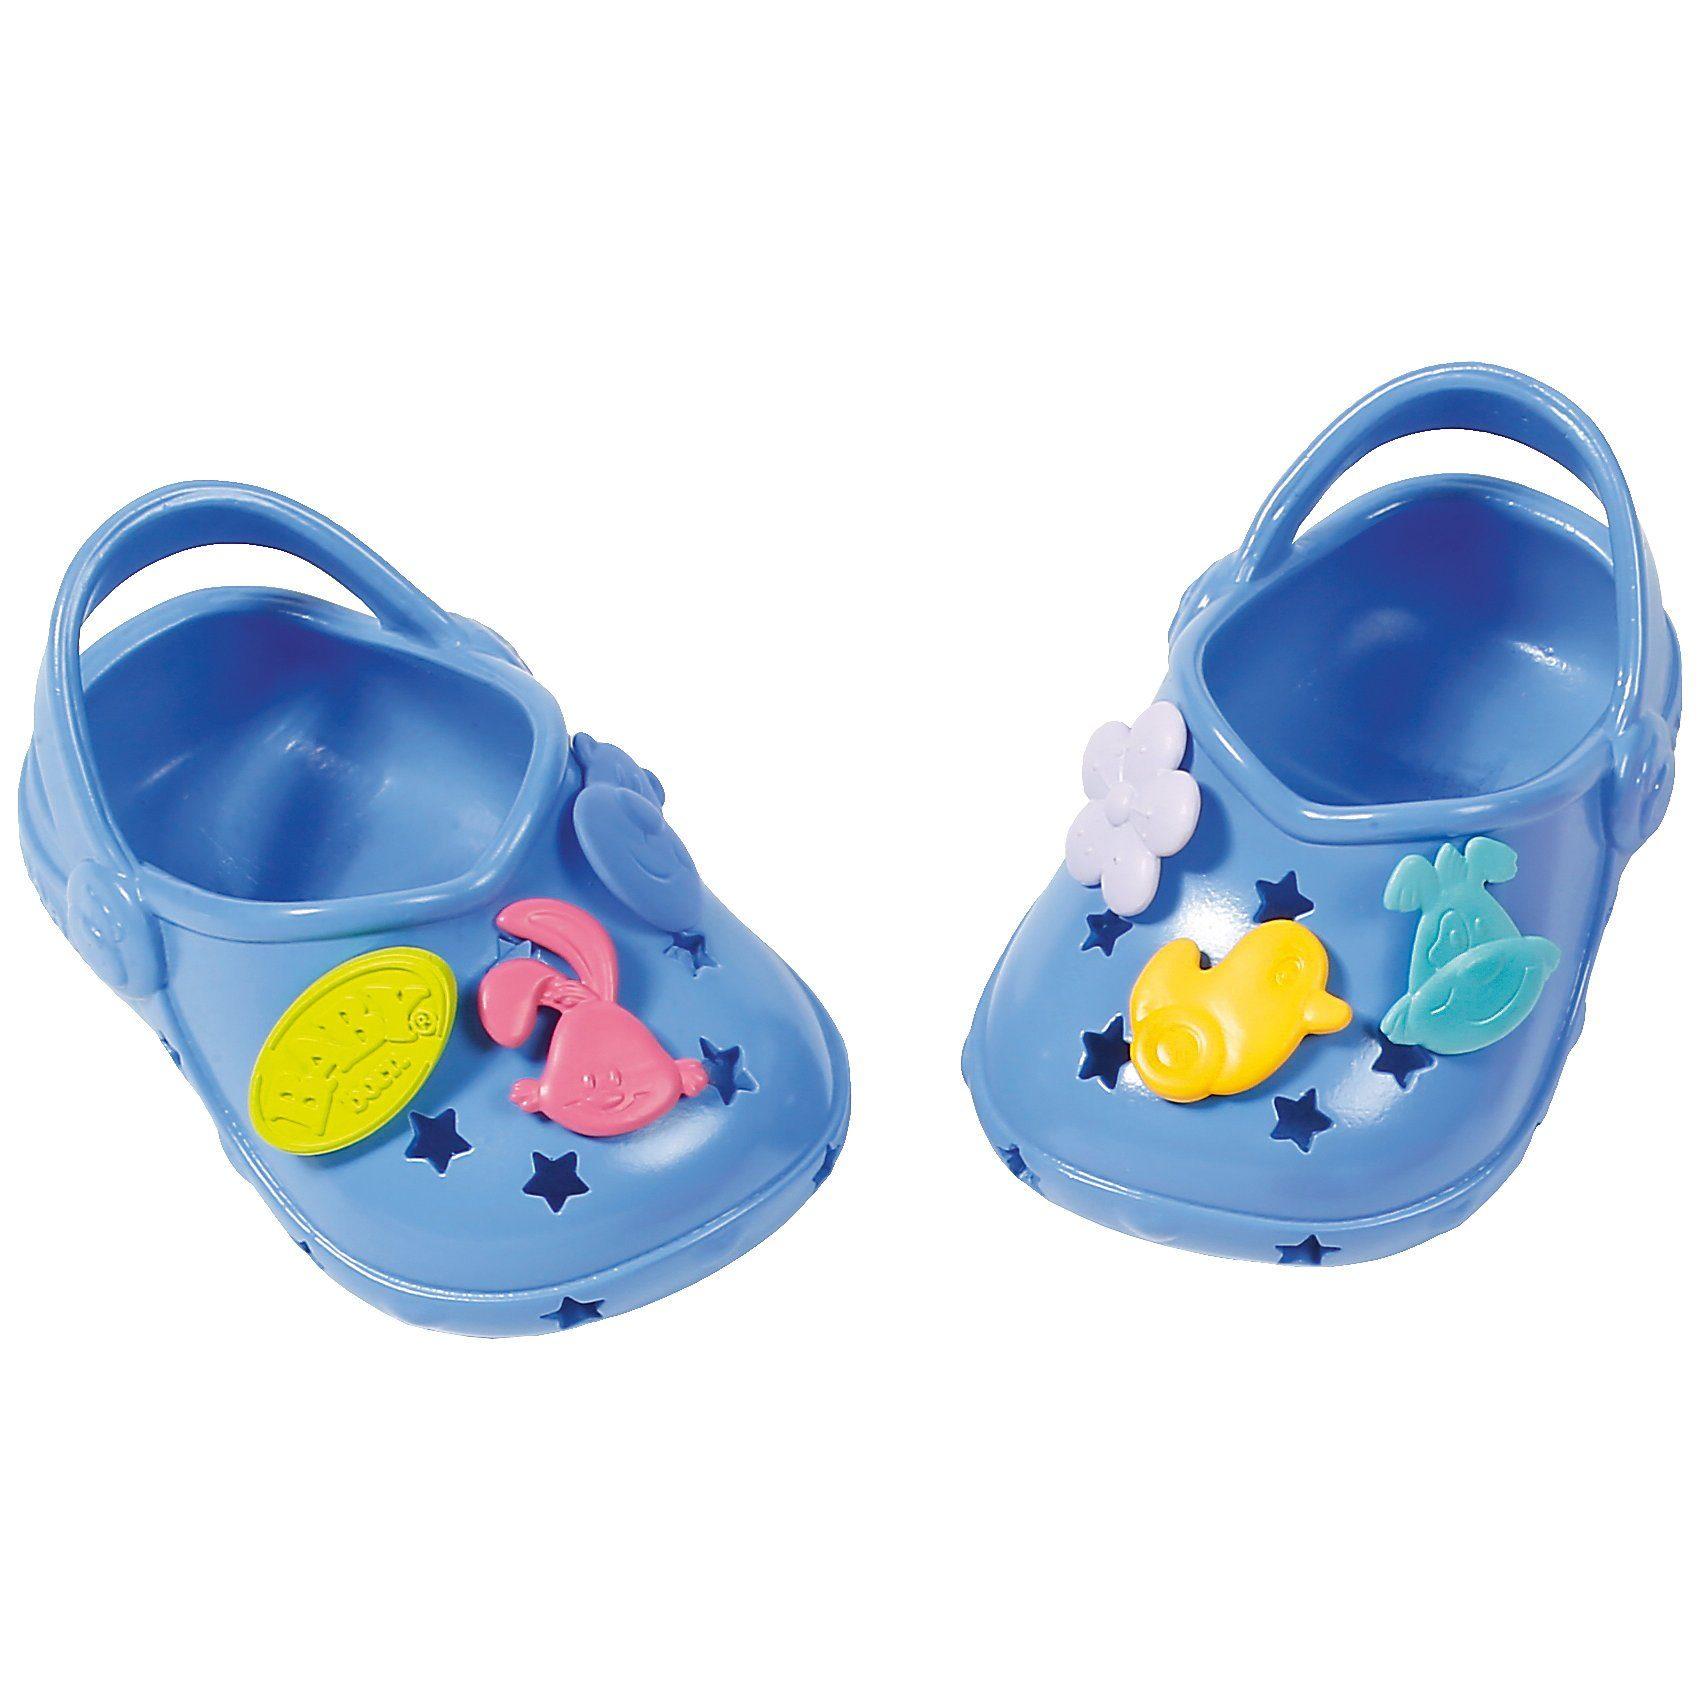 Zapf Creation® BABY born® Clogs mit Pins Blau